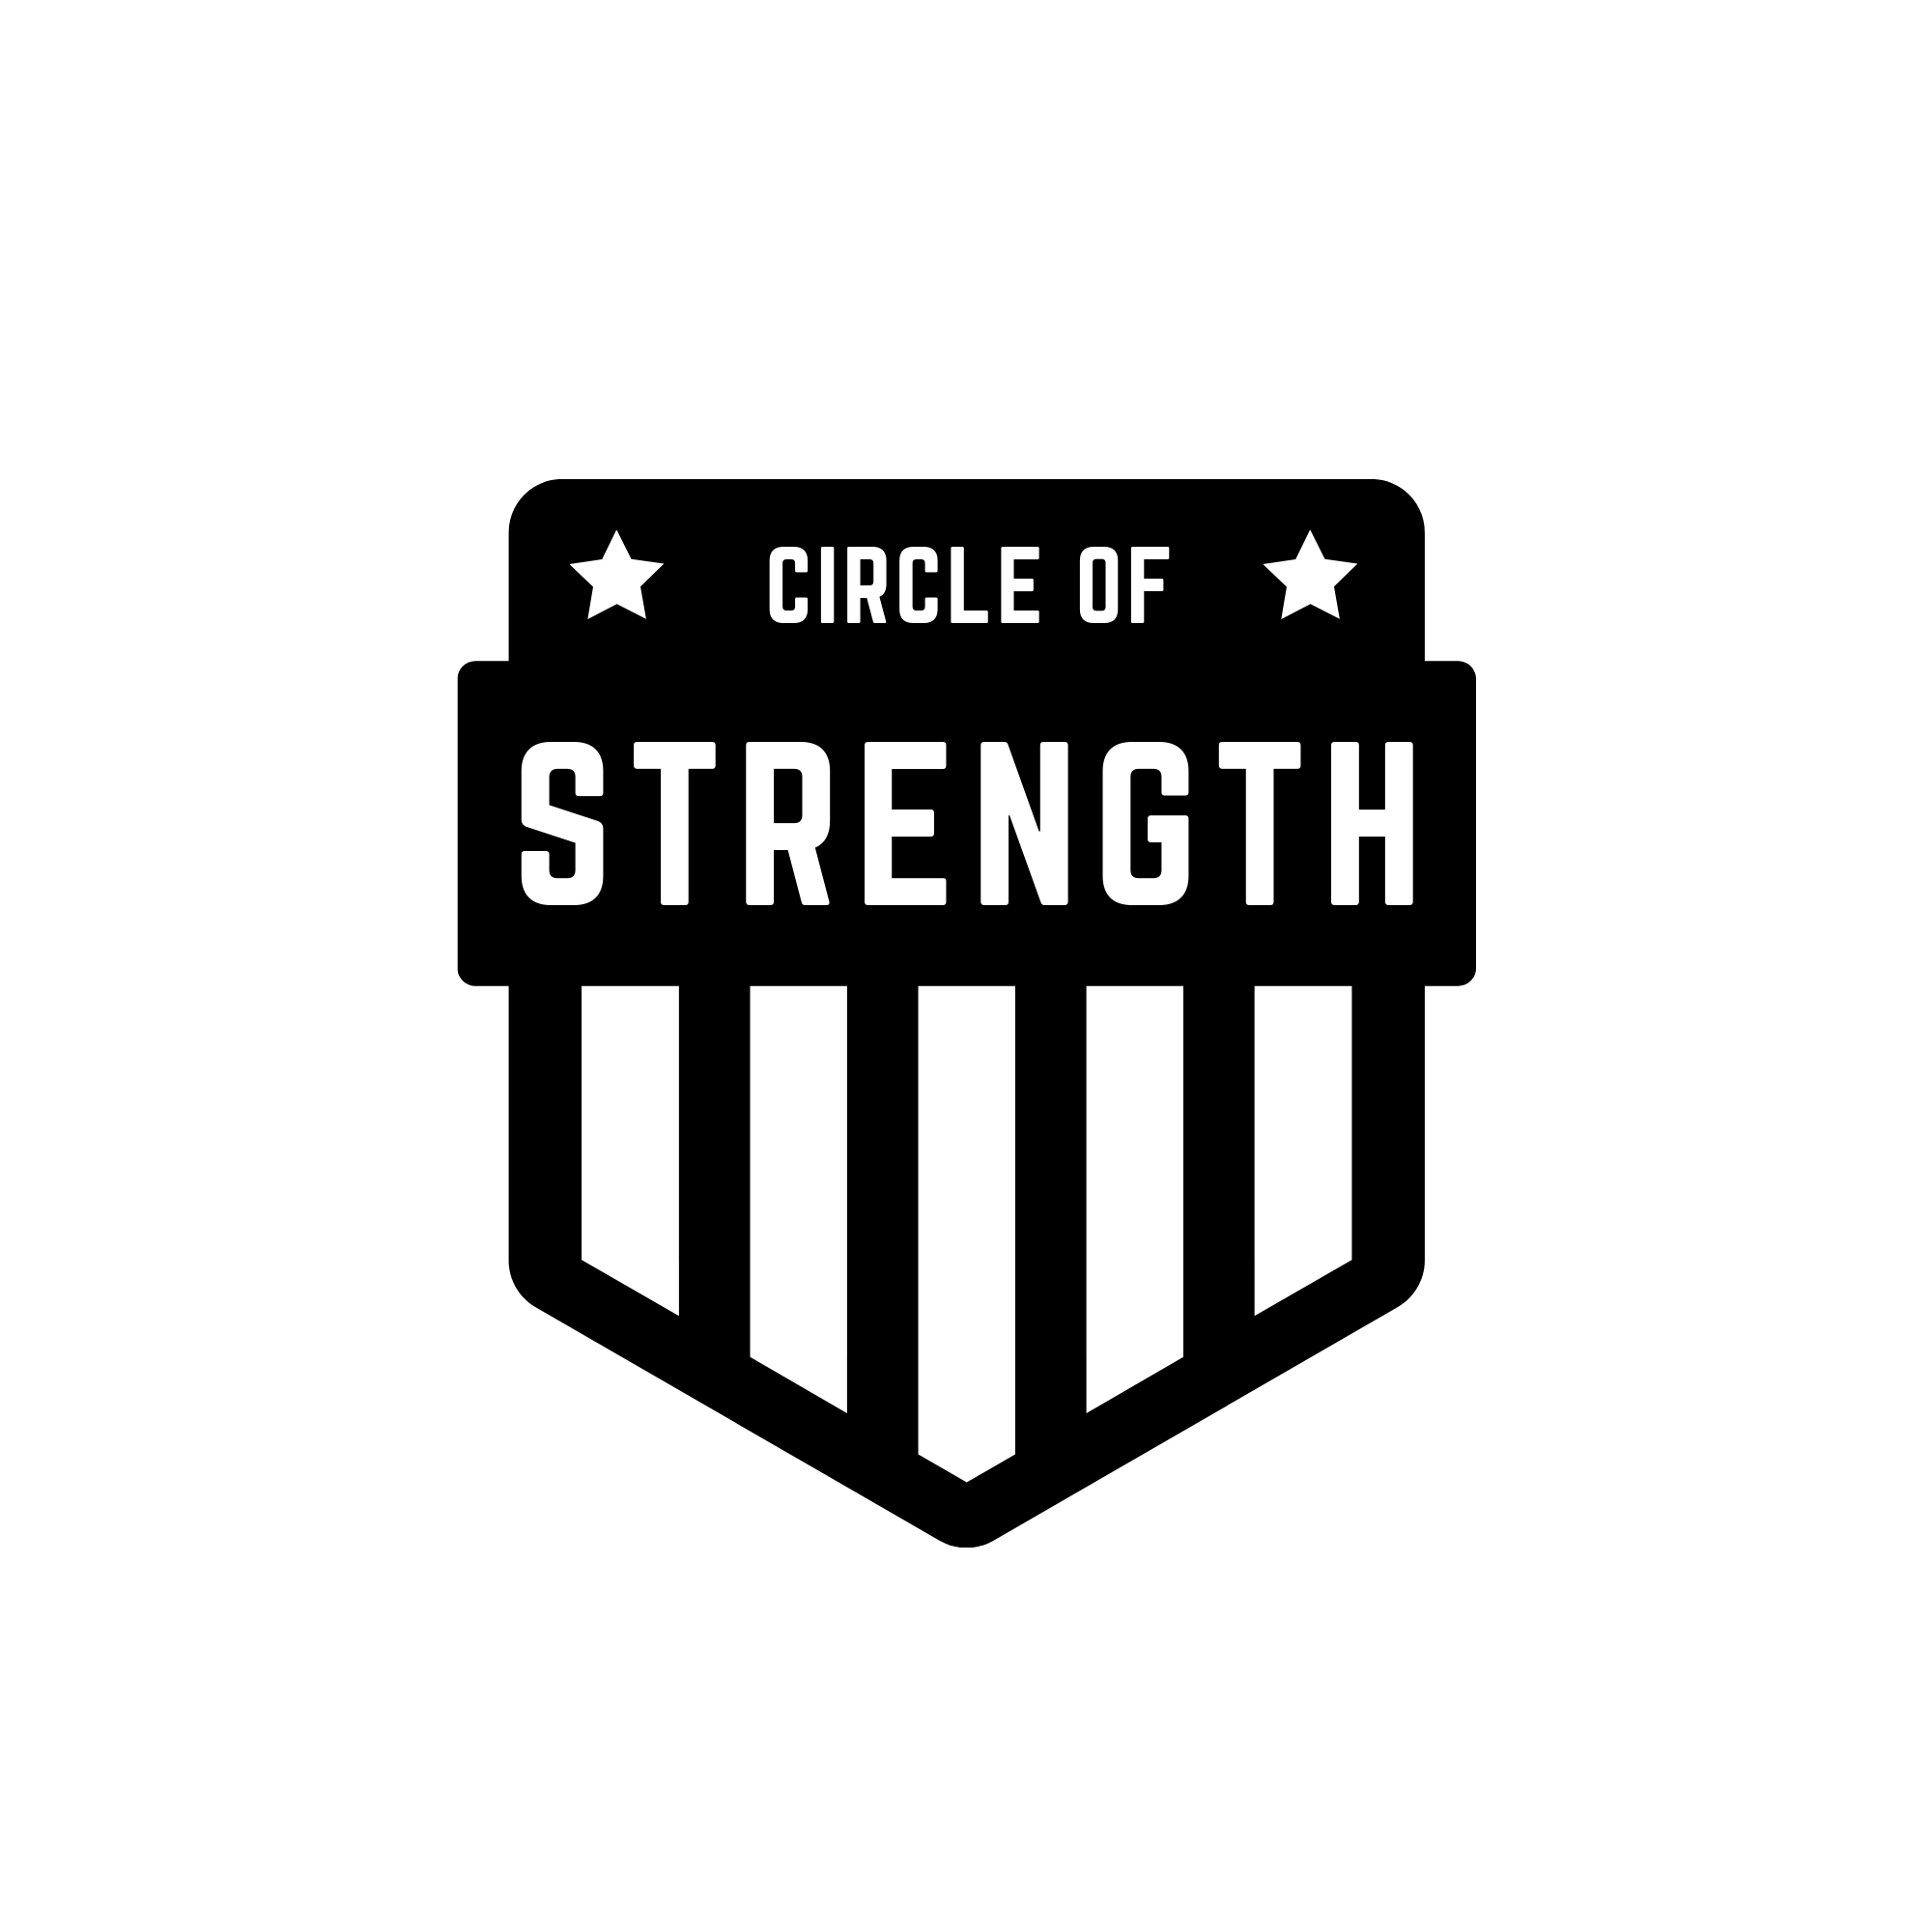 Circle of Strength.png